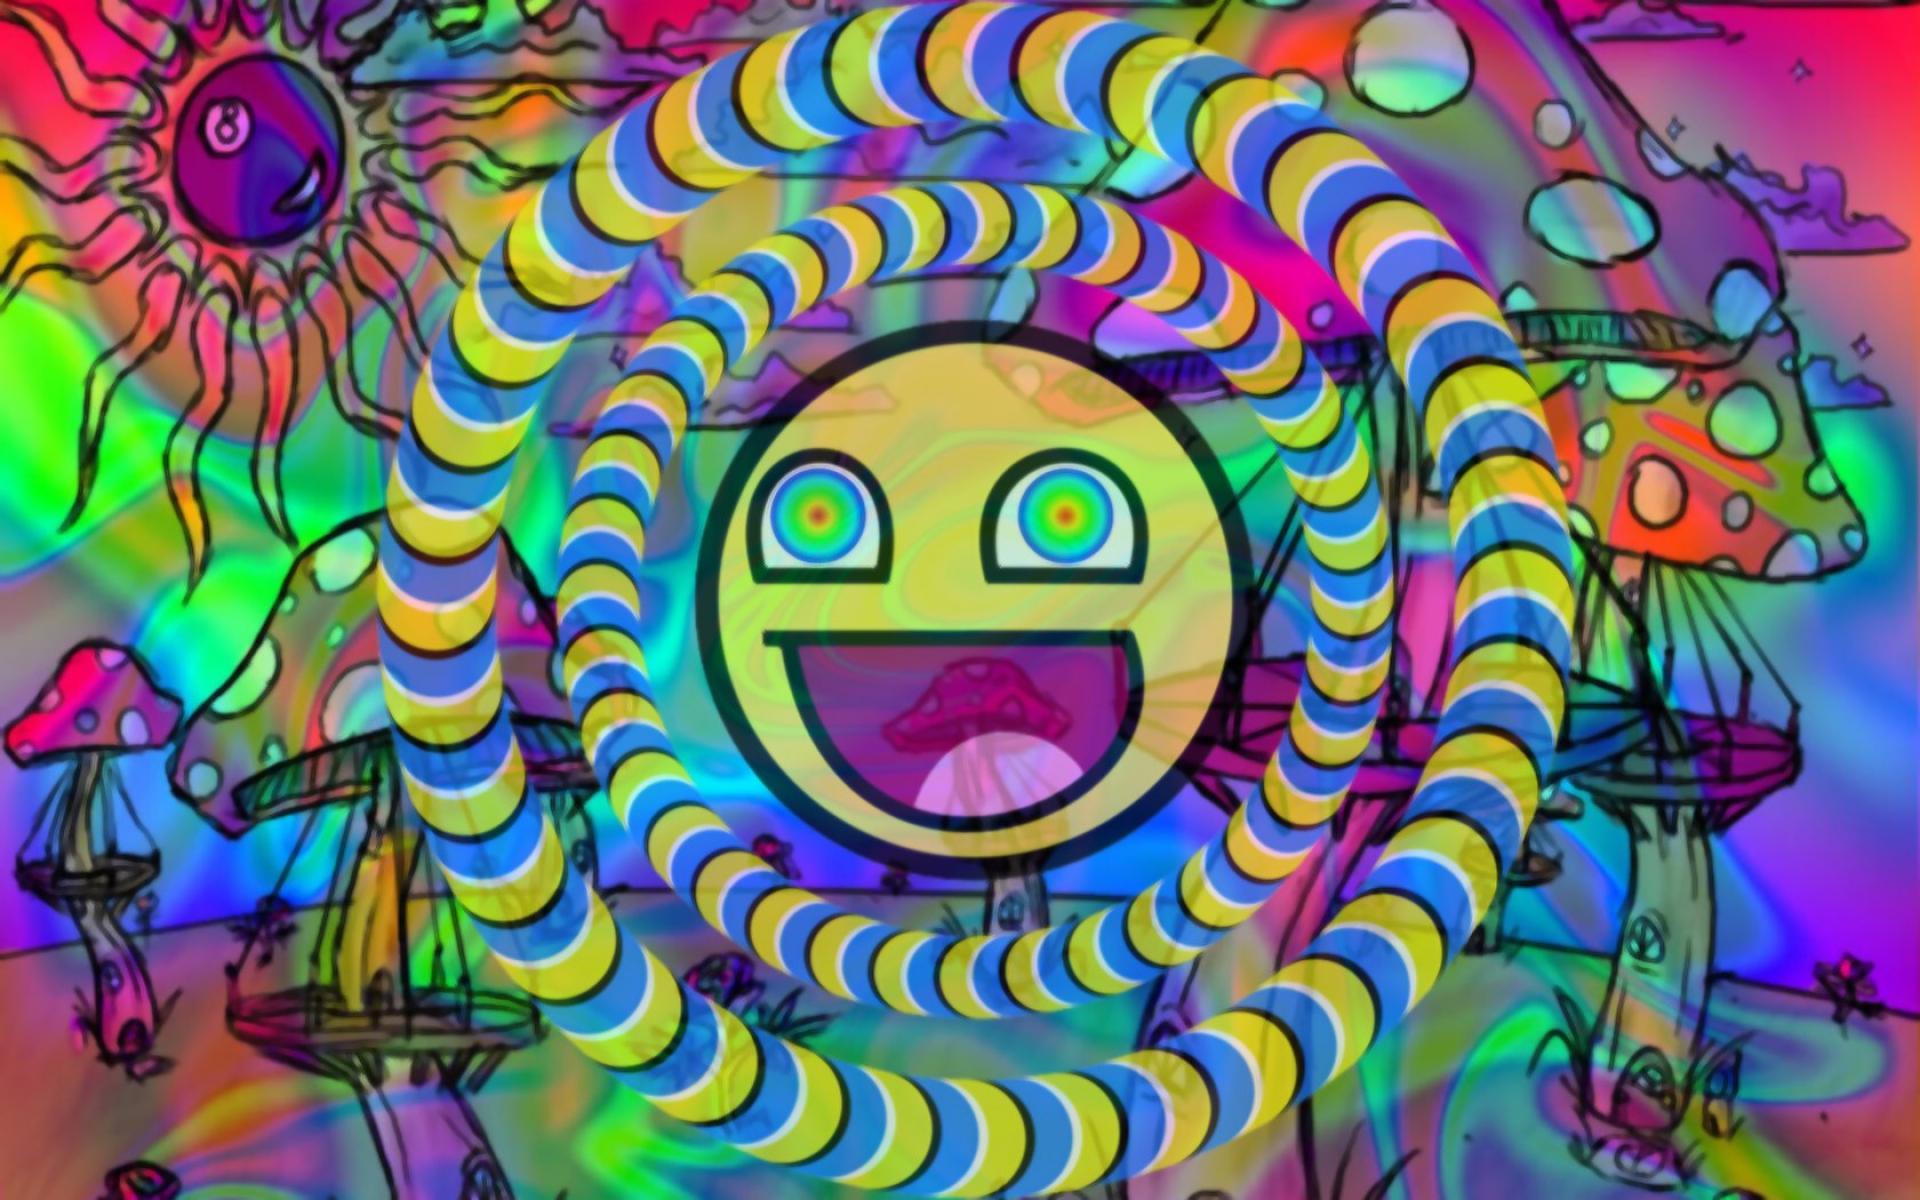 Neon Trippy Wallpaper